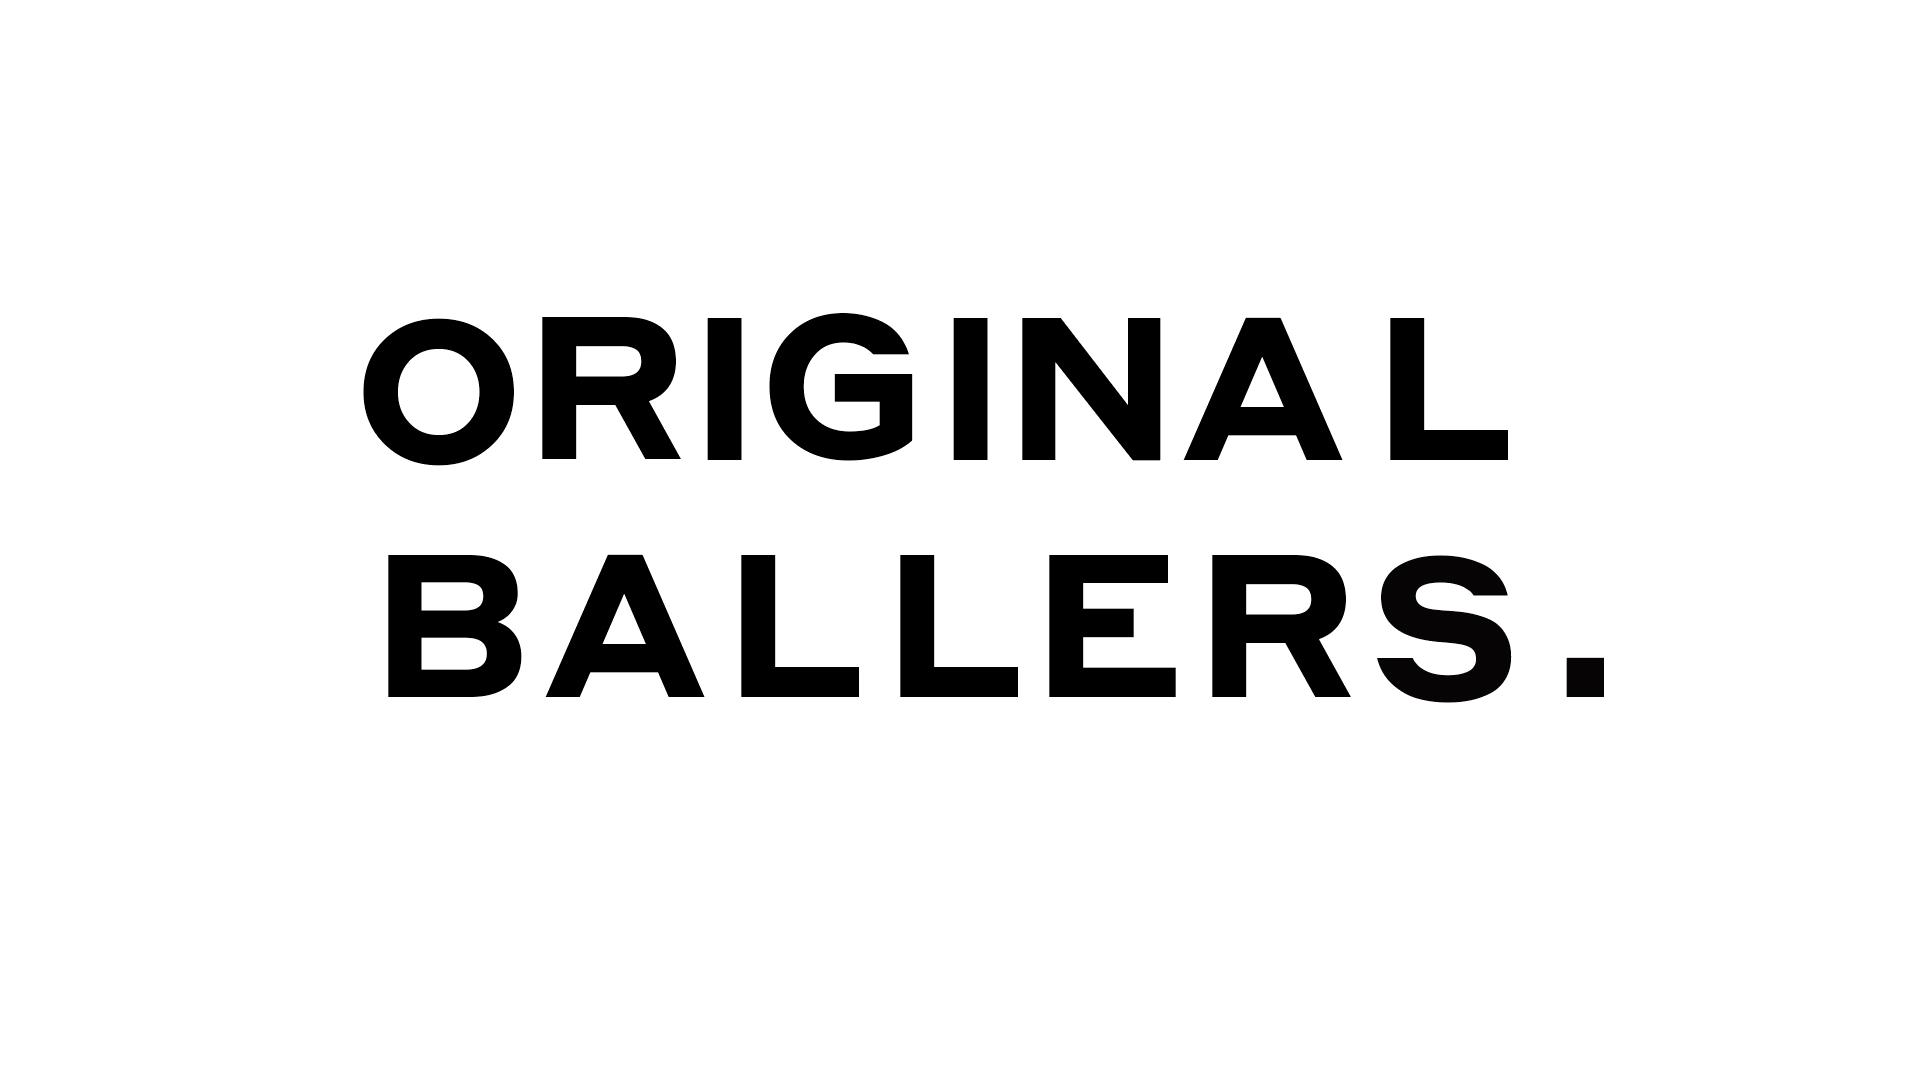 The Original Ballers